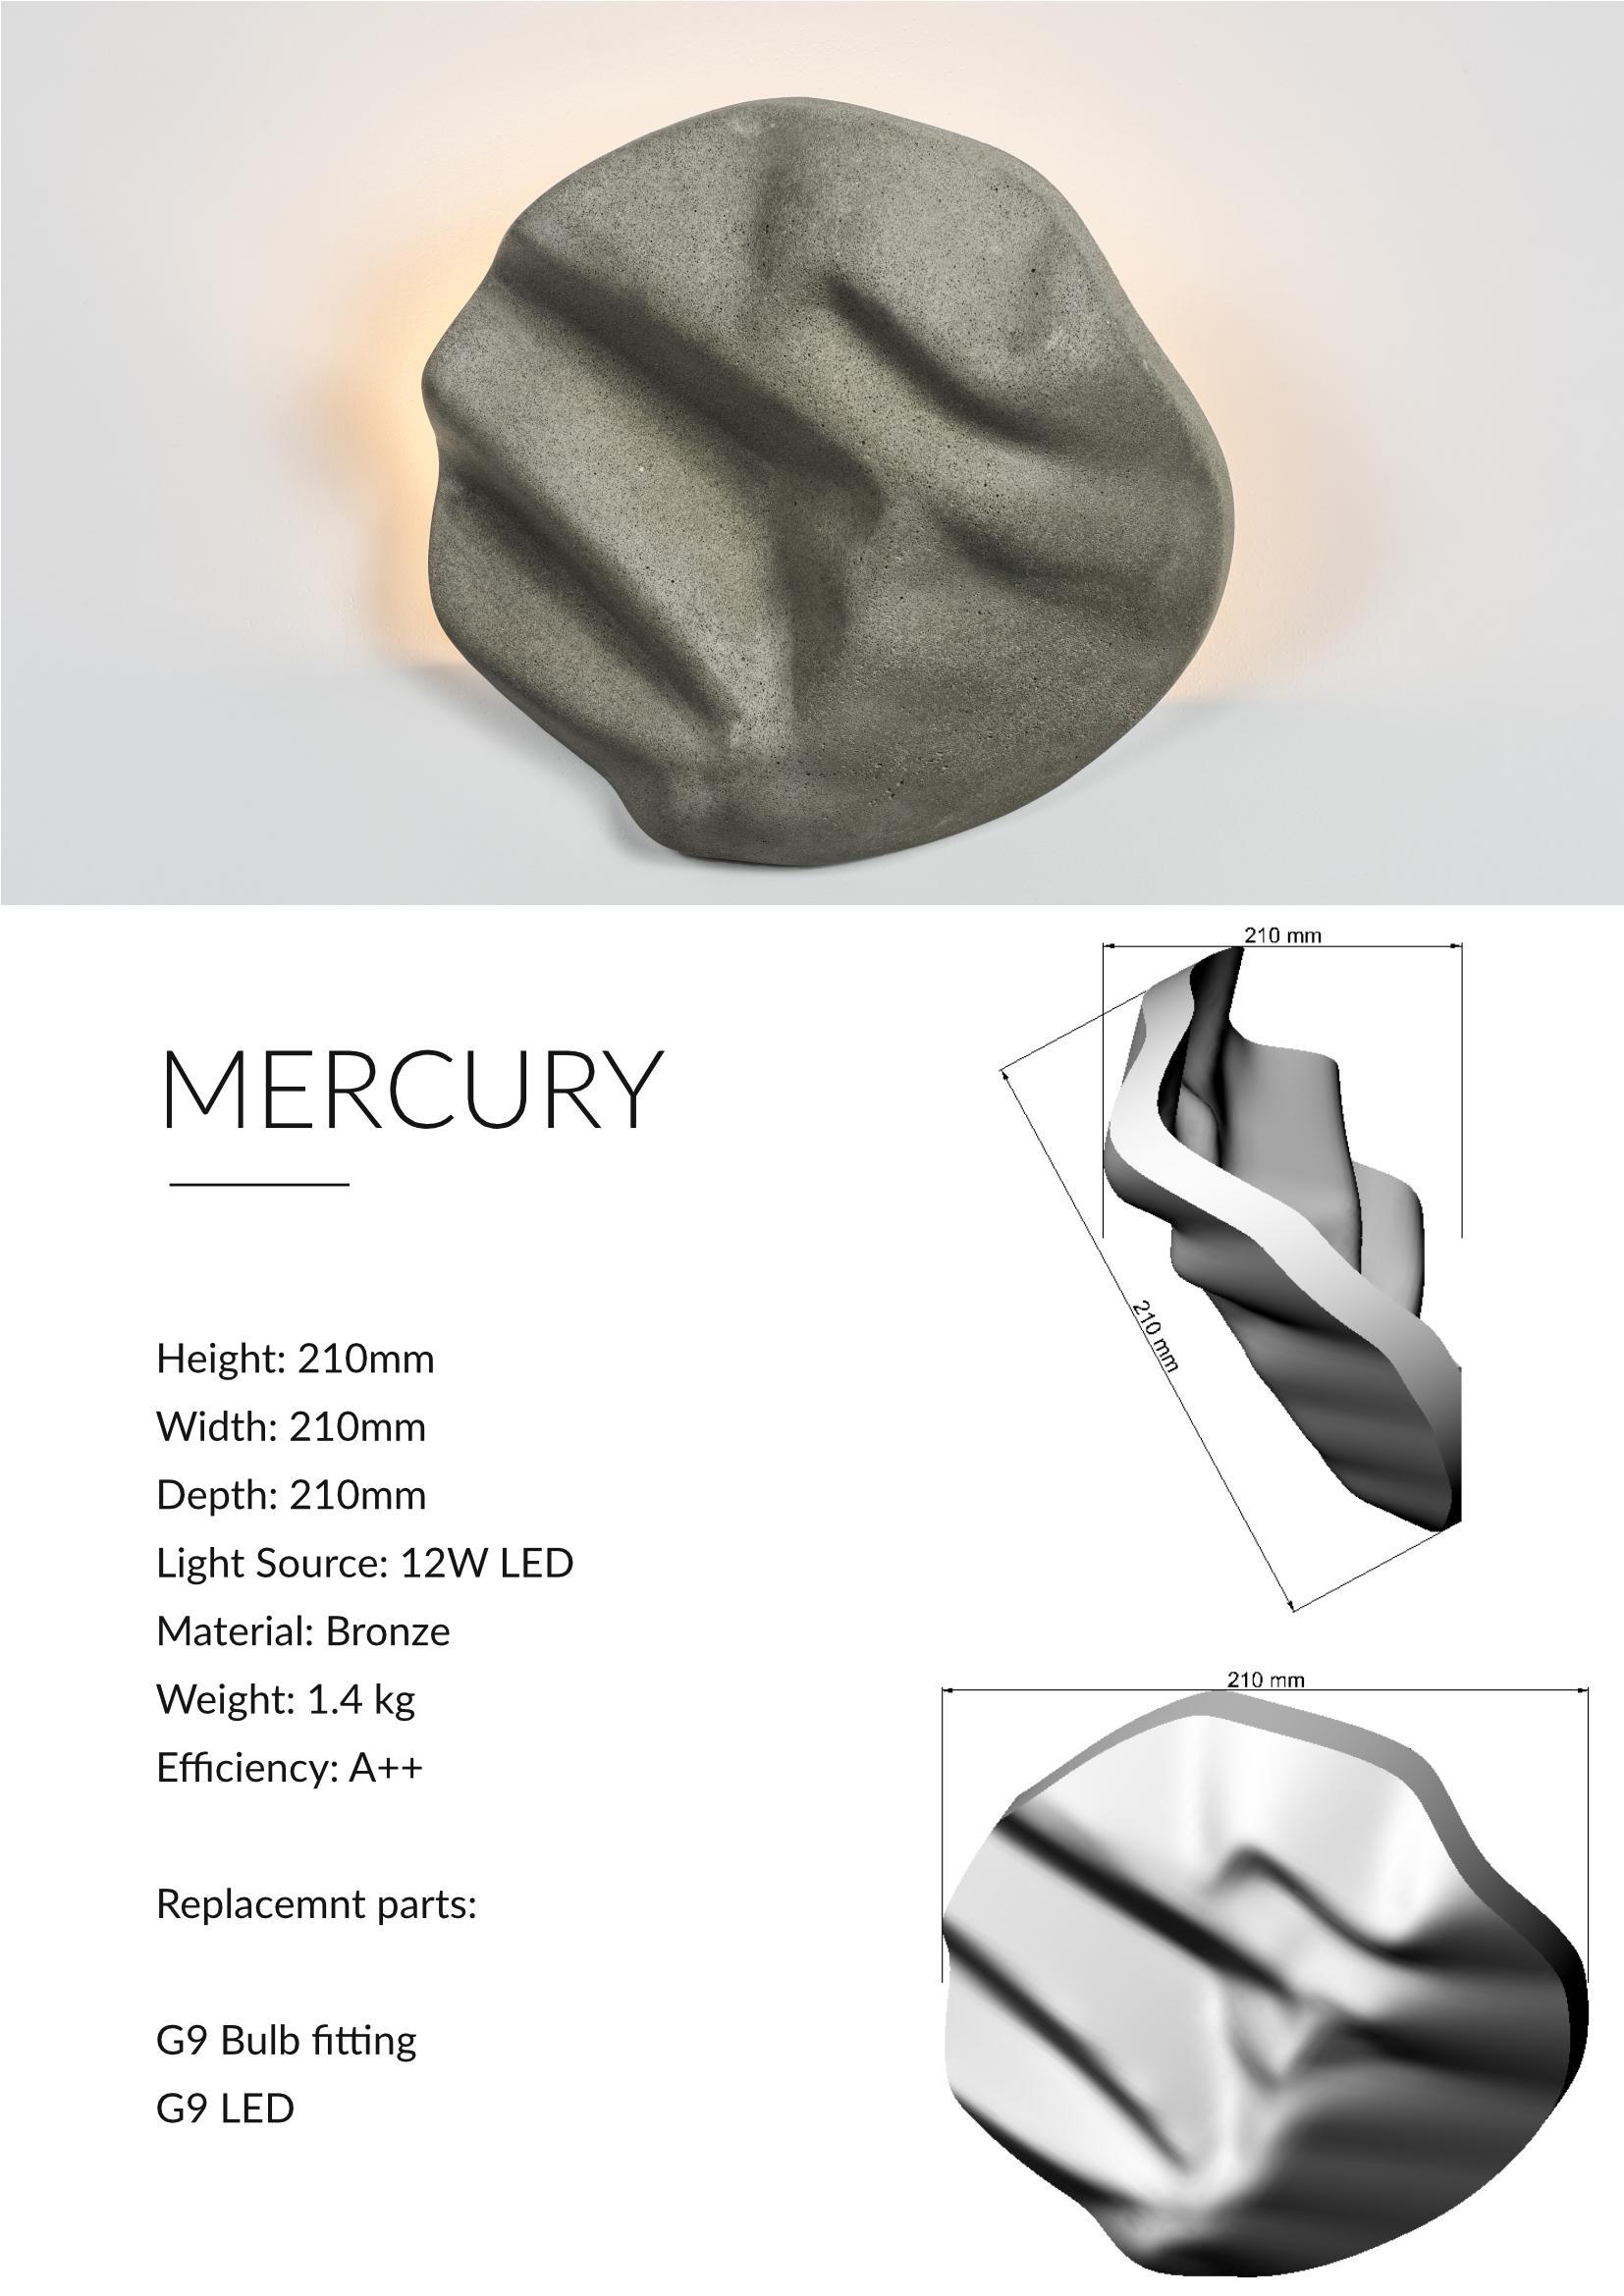 Mercury Contemporary Uplighter Design Technical Sheet